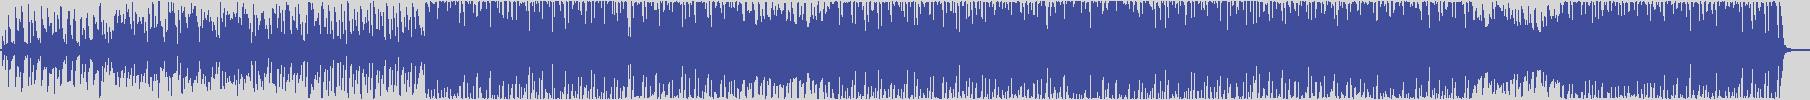 gold_hit_records [GHR003] Lucas Castro - Sole D'estate [Radio Edit] audio wave form